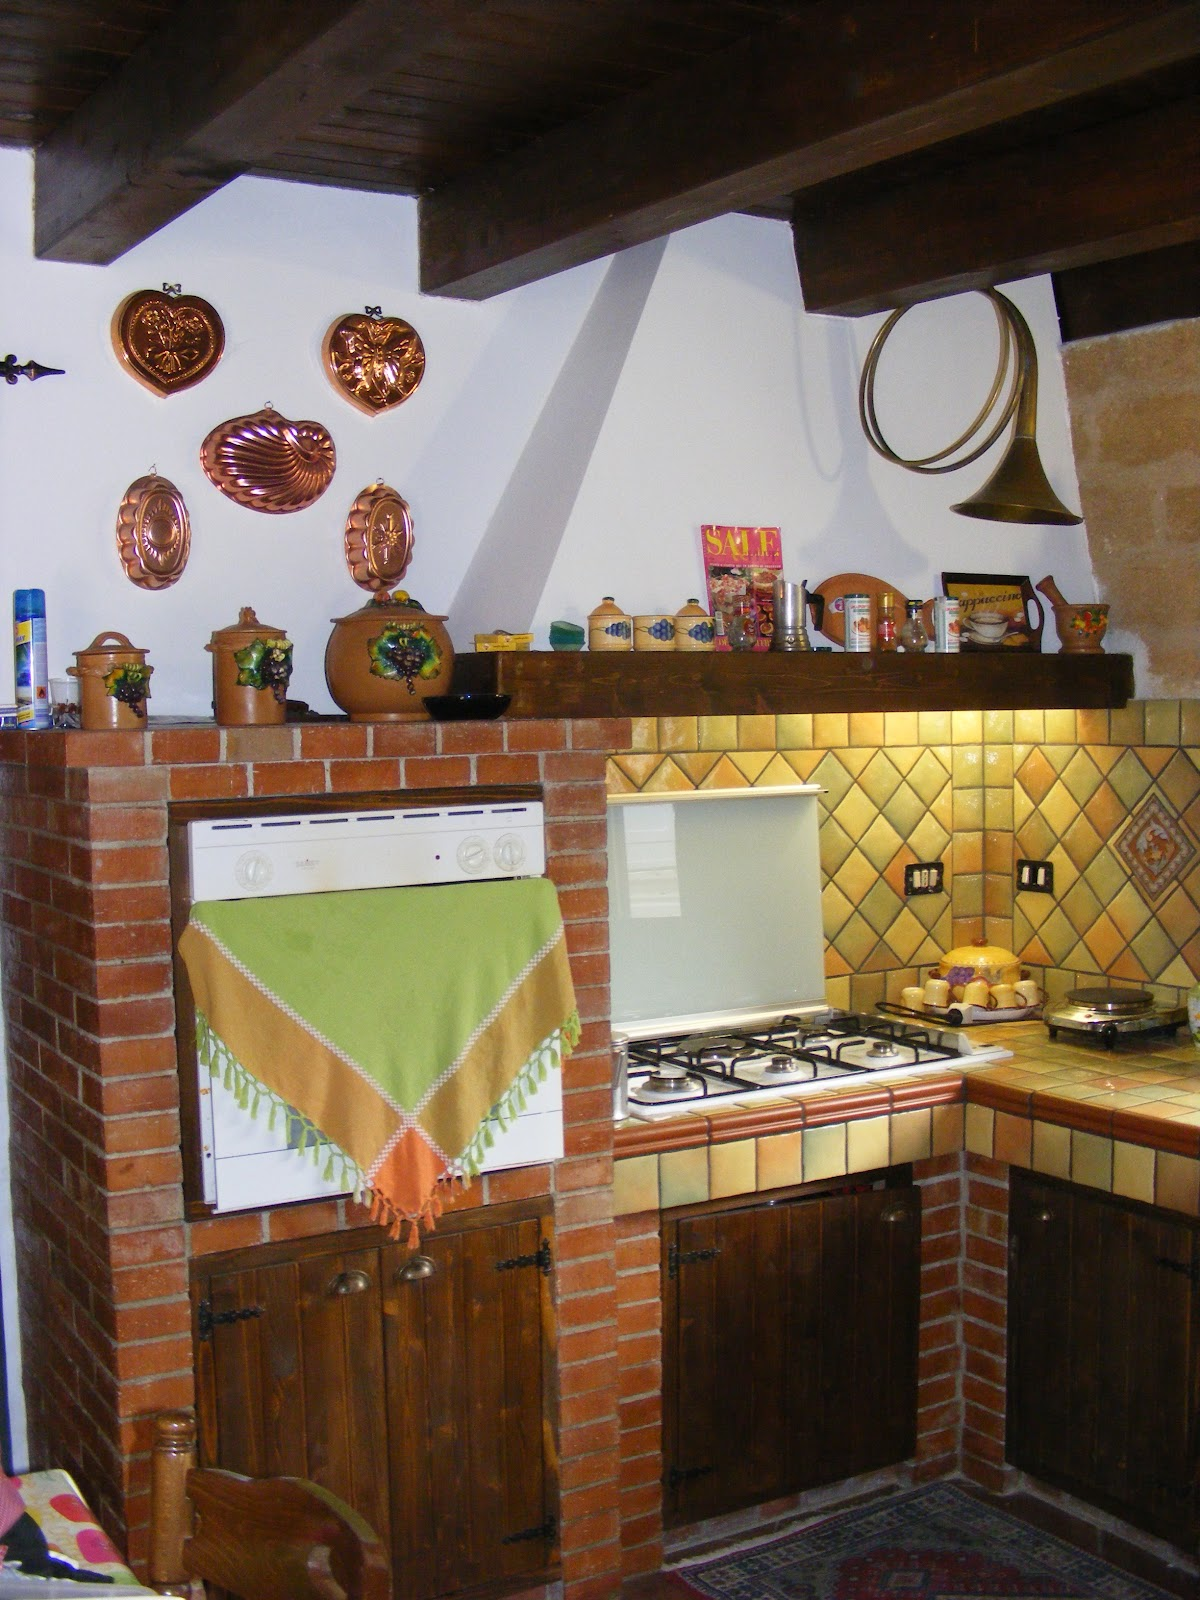 Pavimenti cortili  modelli di cucine in muratura